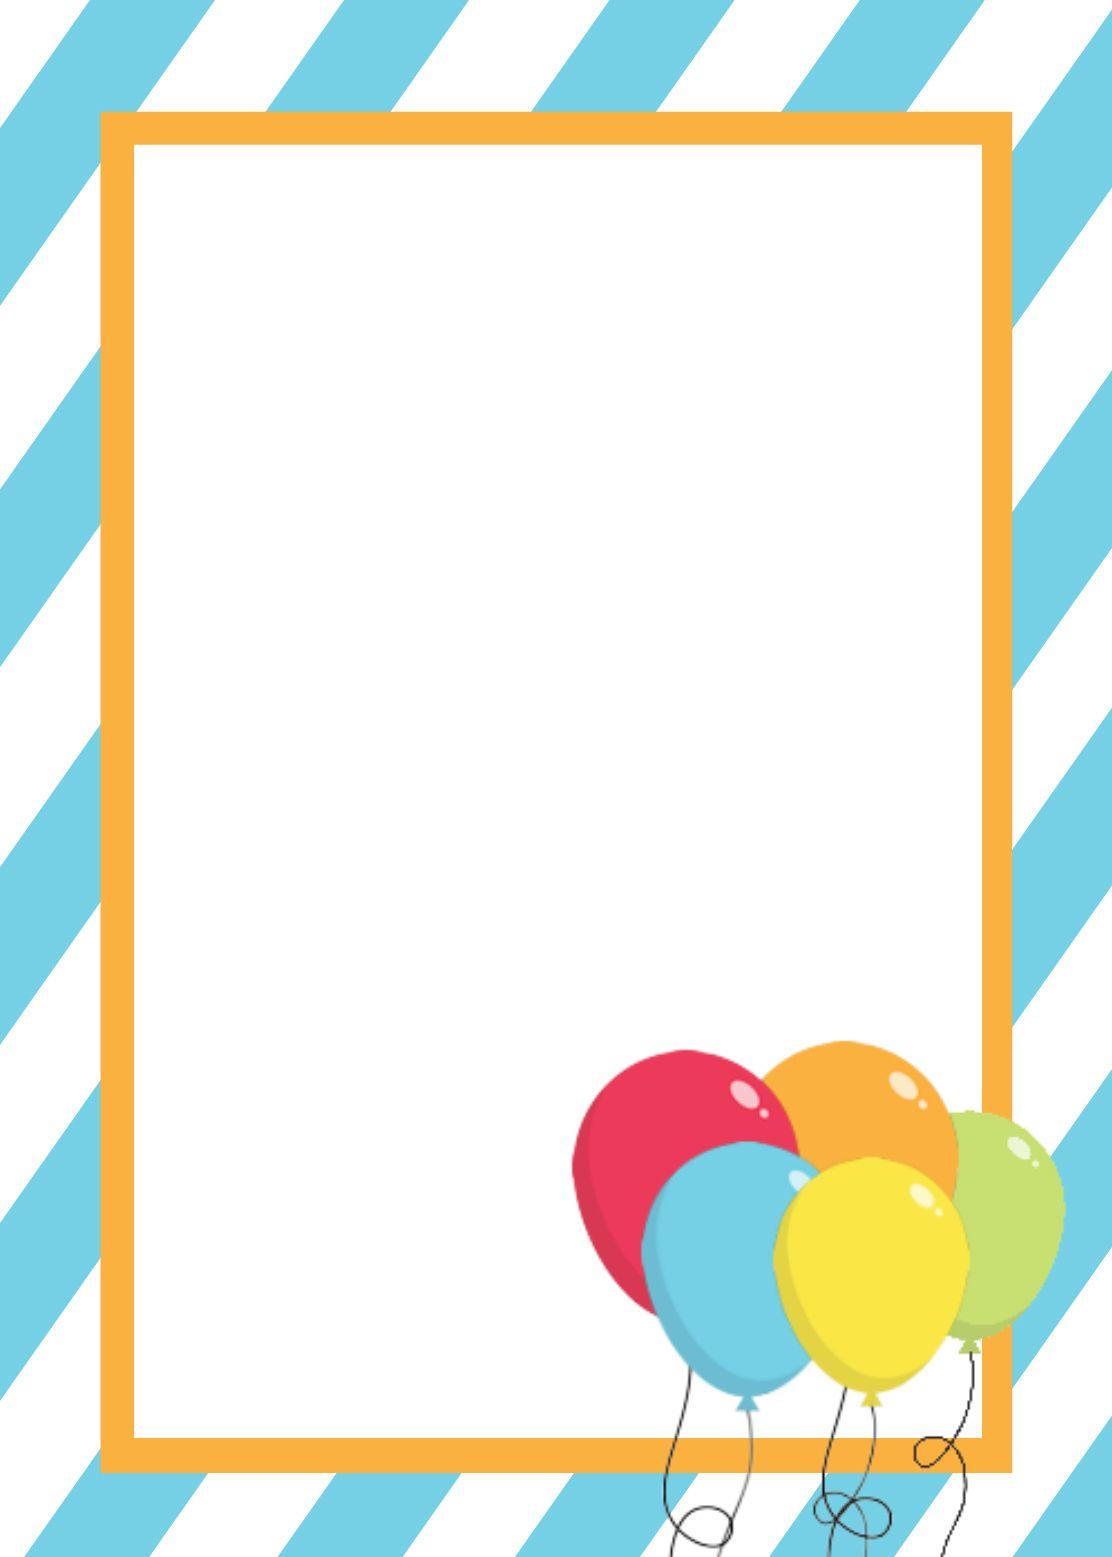 Free Printable Birthday Invitation Templates | Birthday Ideas And in Frame Birthday Calendar Templates Free